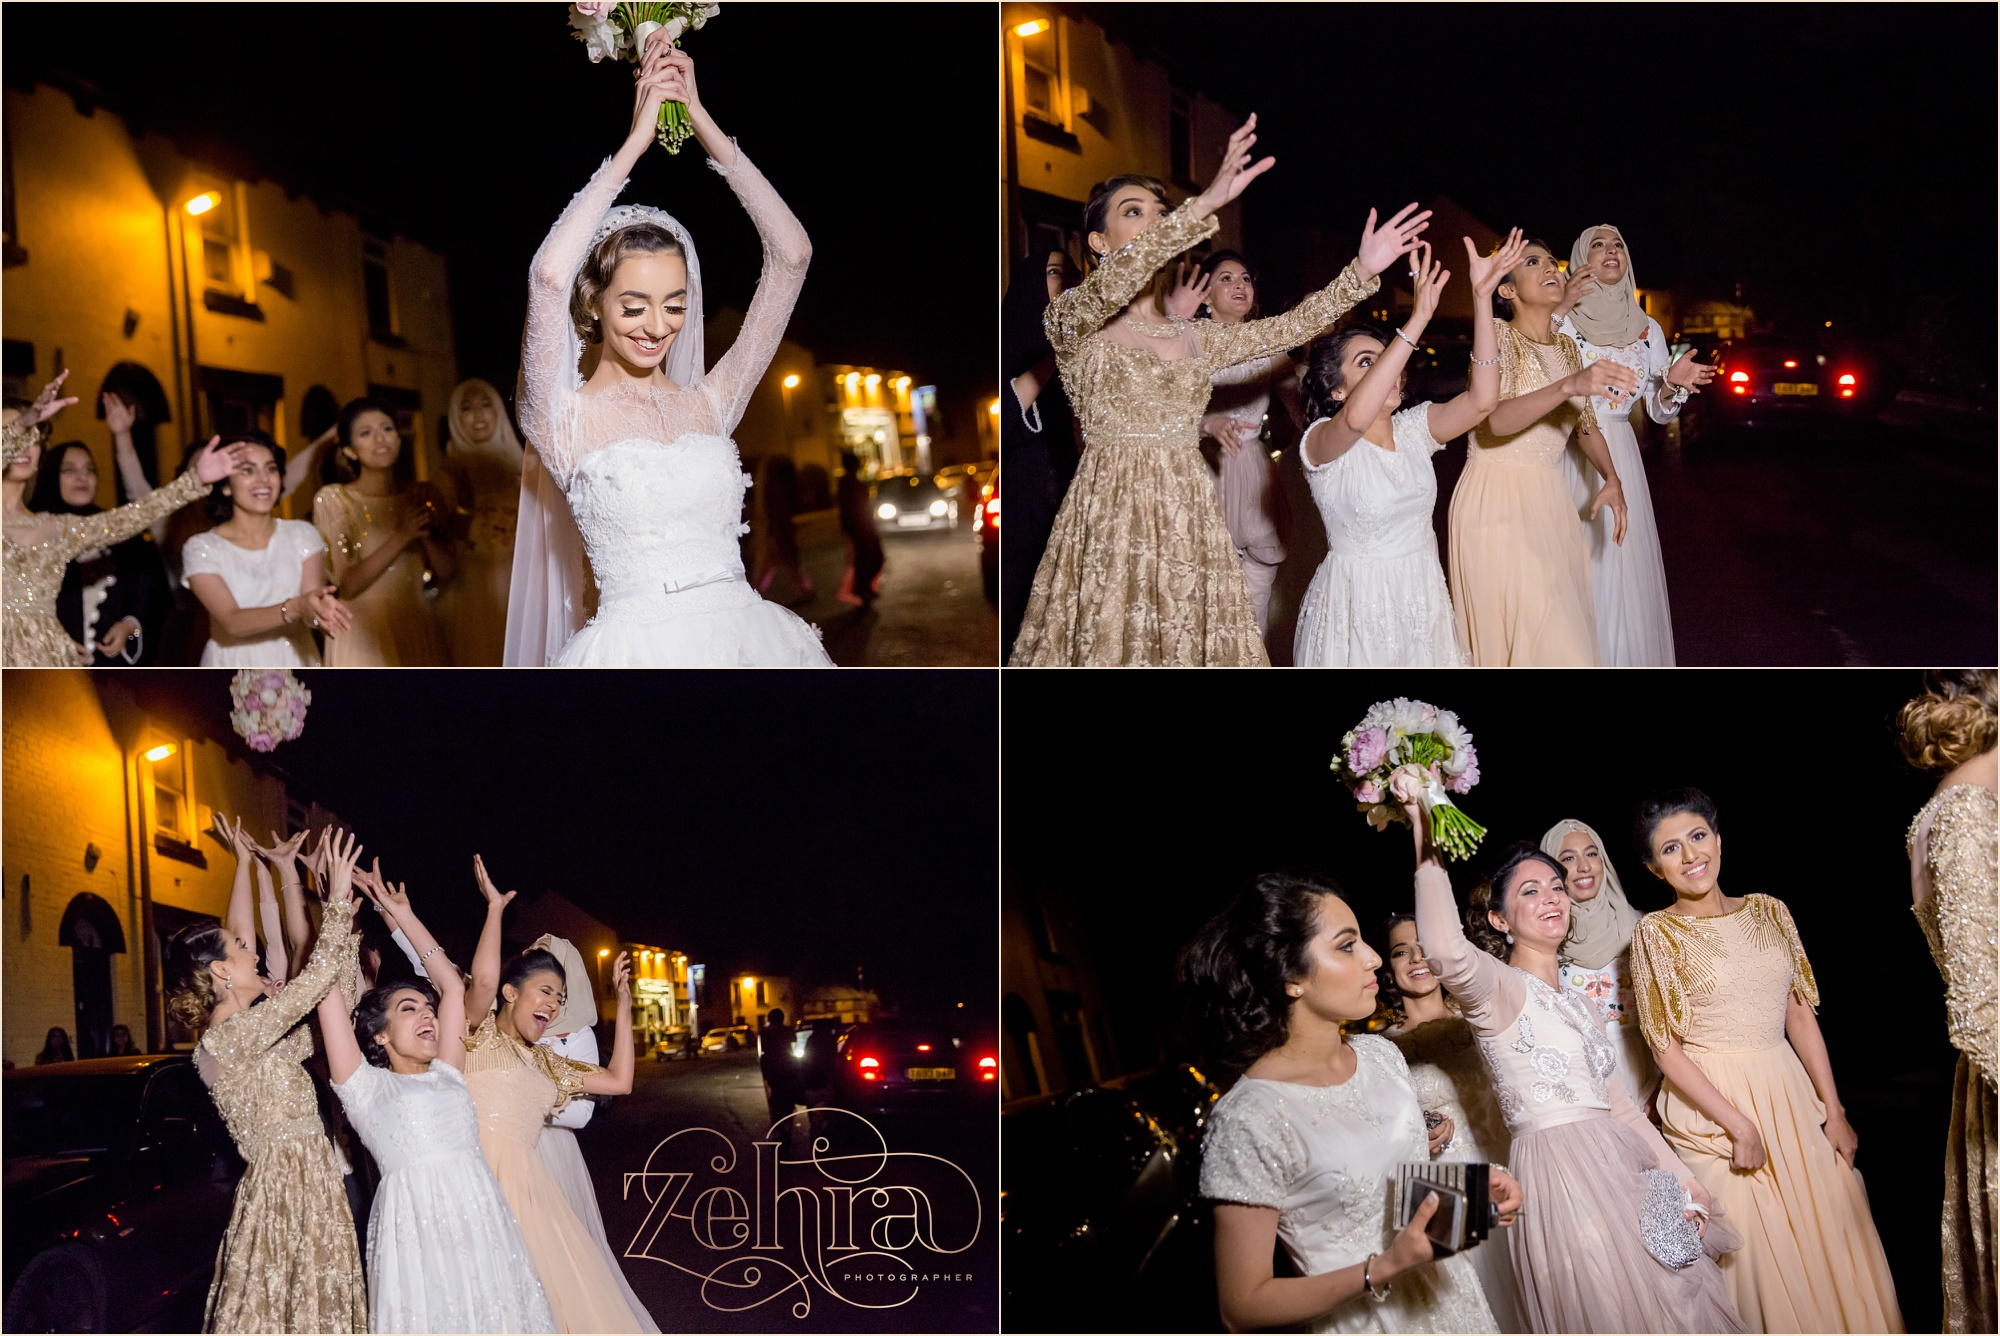 jasira manchester wedding photographer_0046.jpg